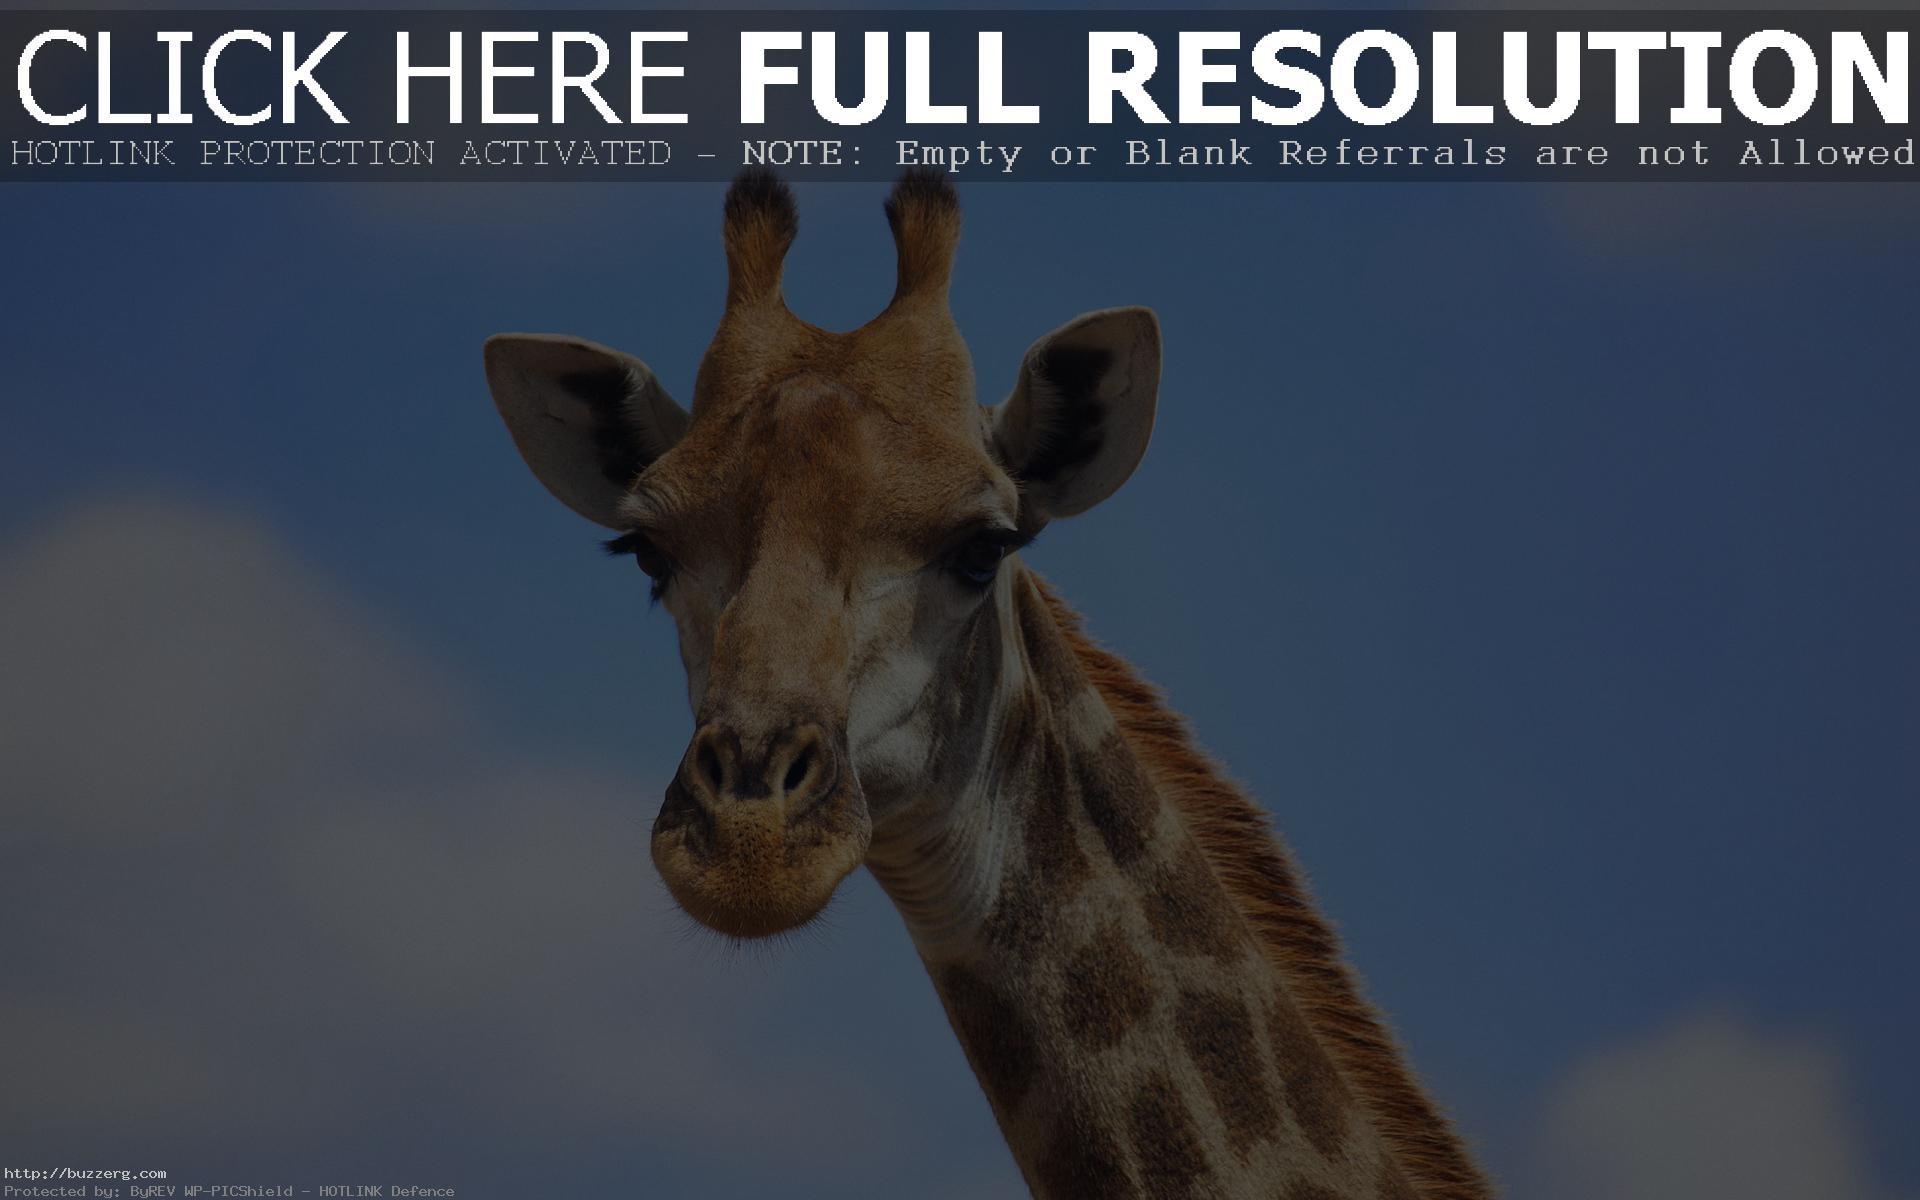 Cute Giraffe (id: 23755)